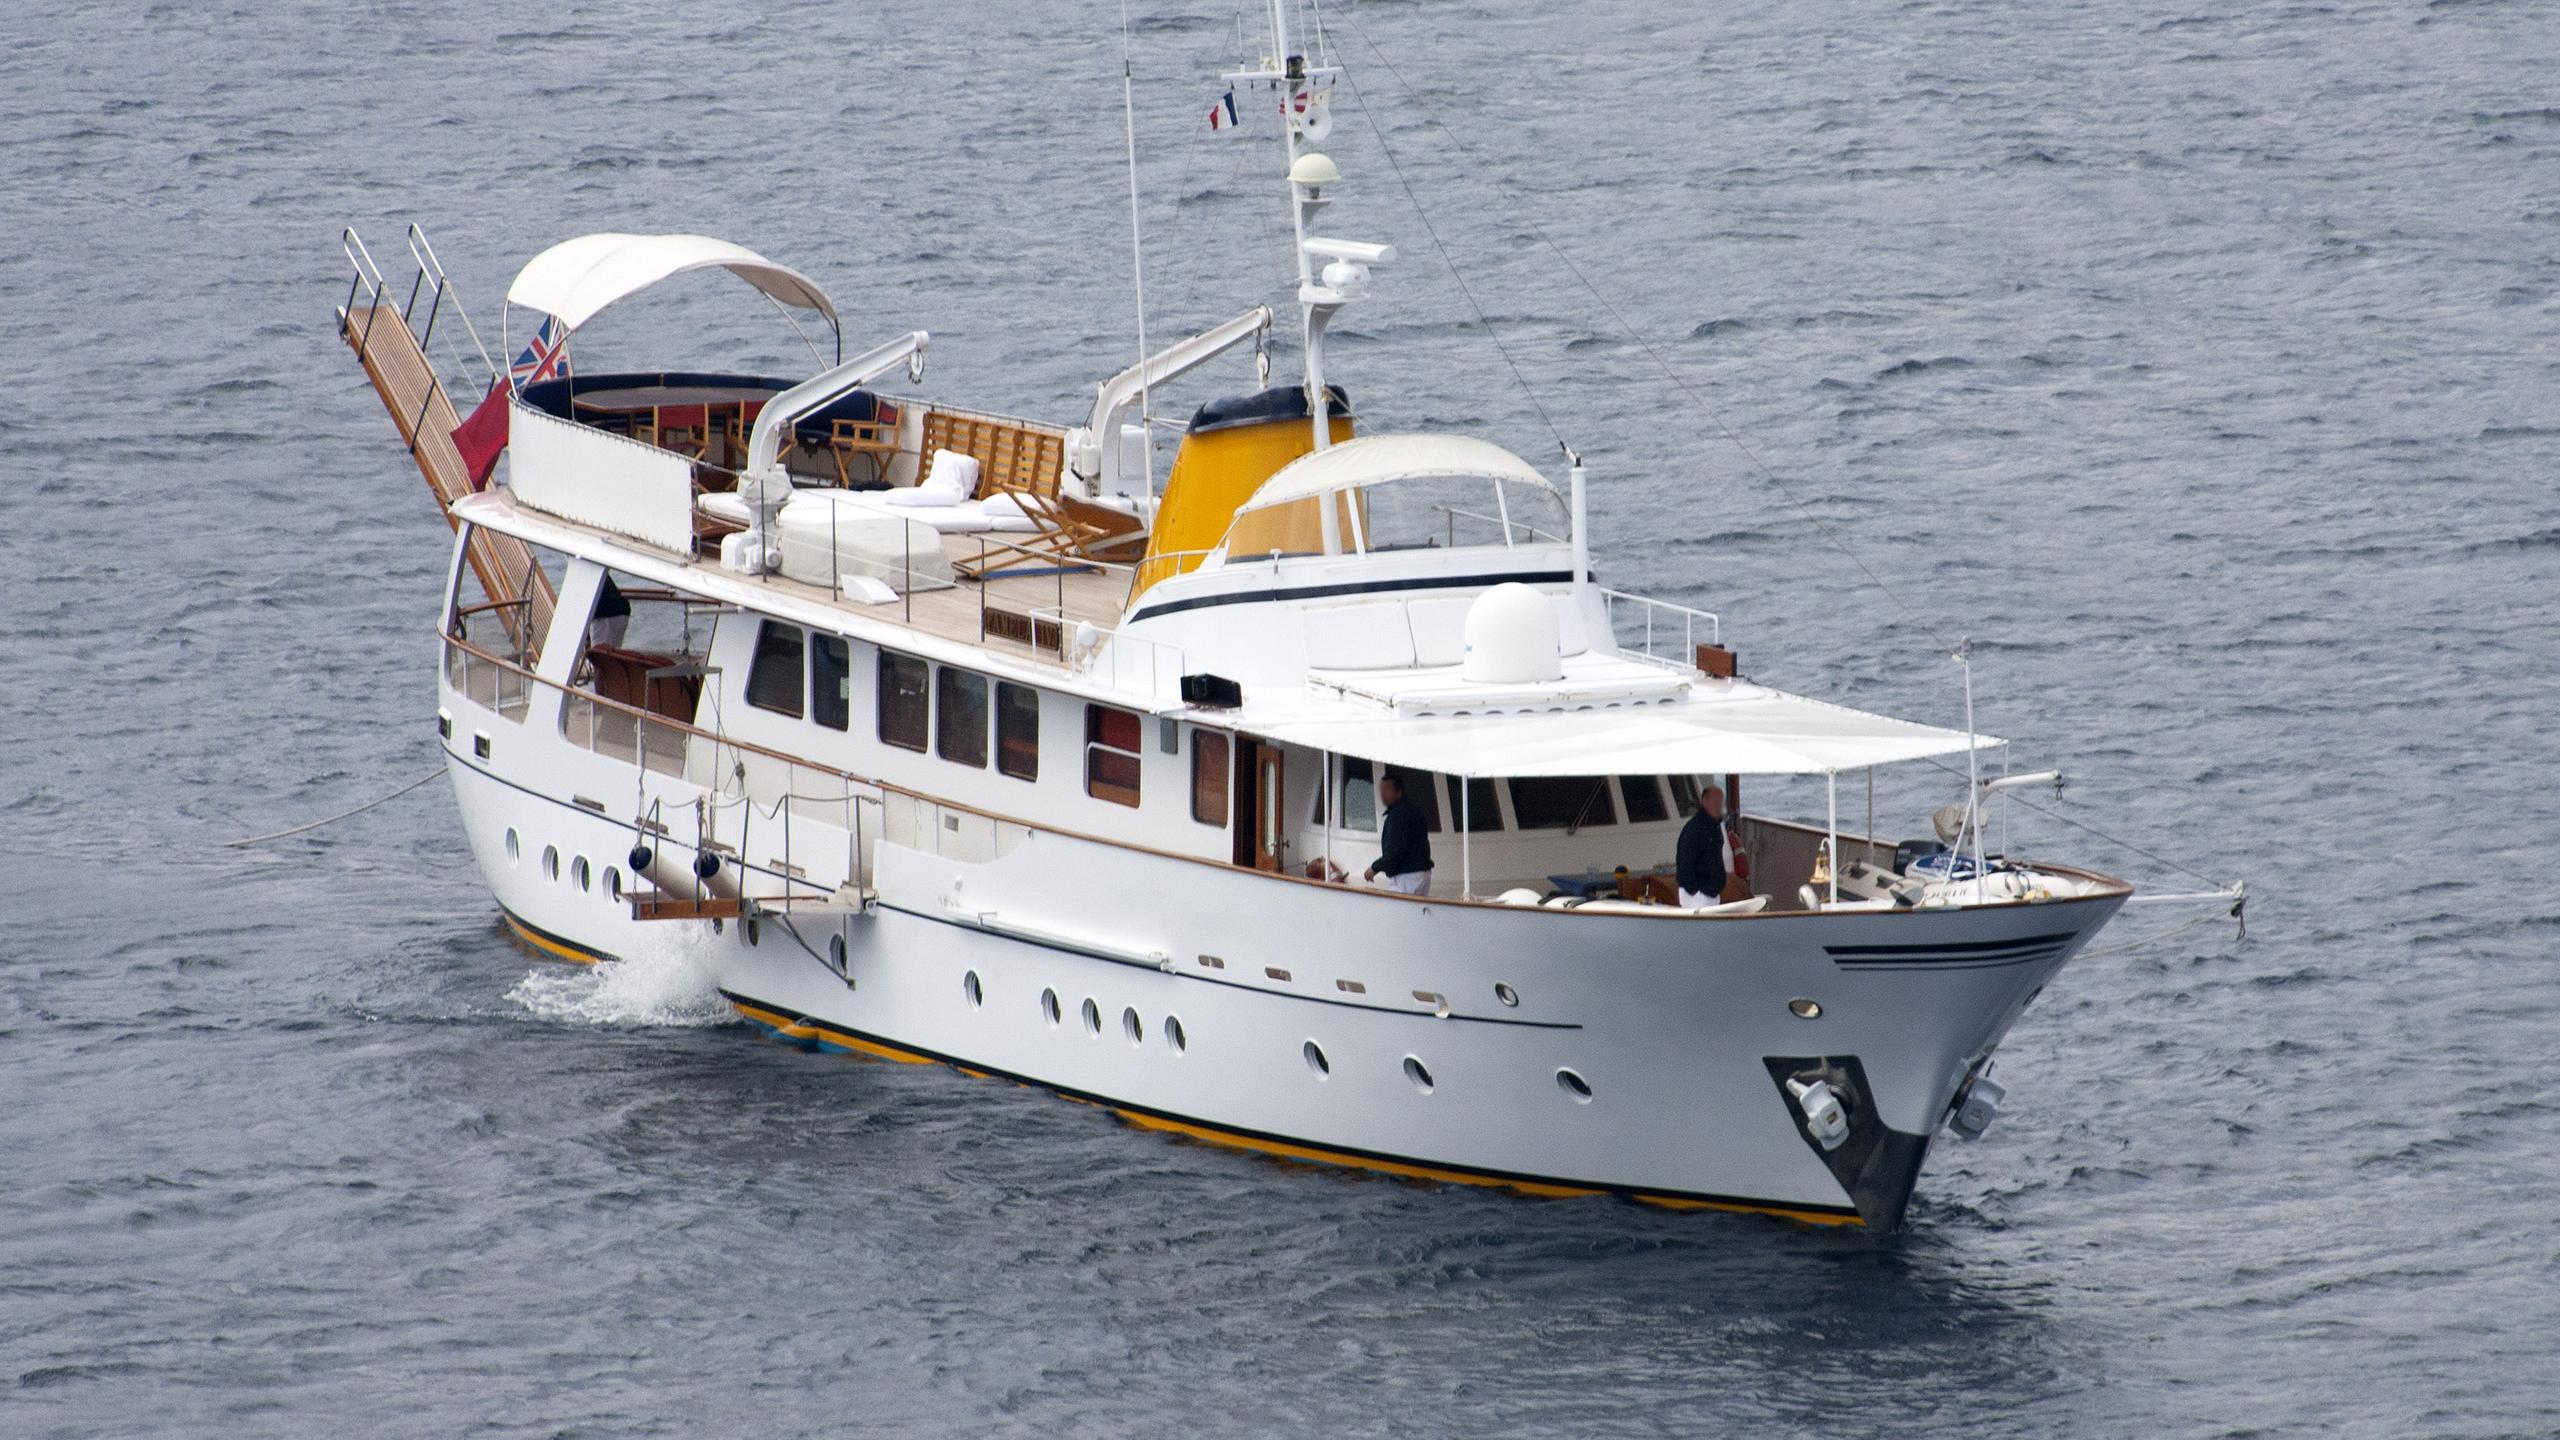 pamela-iv-of-london-classic-motor-yacht-cnl-liguri-1962-31m-running-half-profile